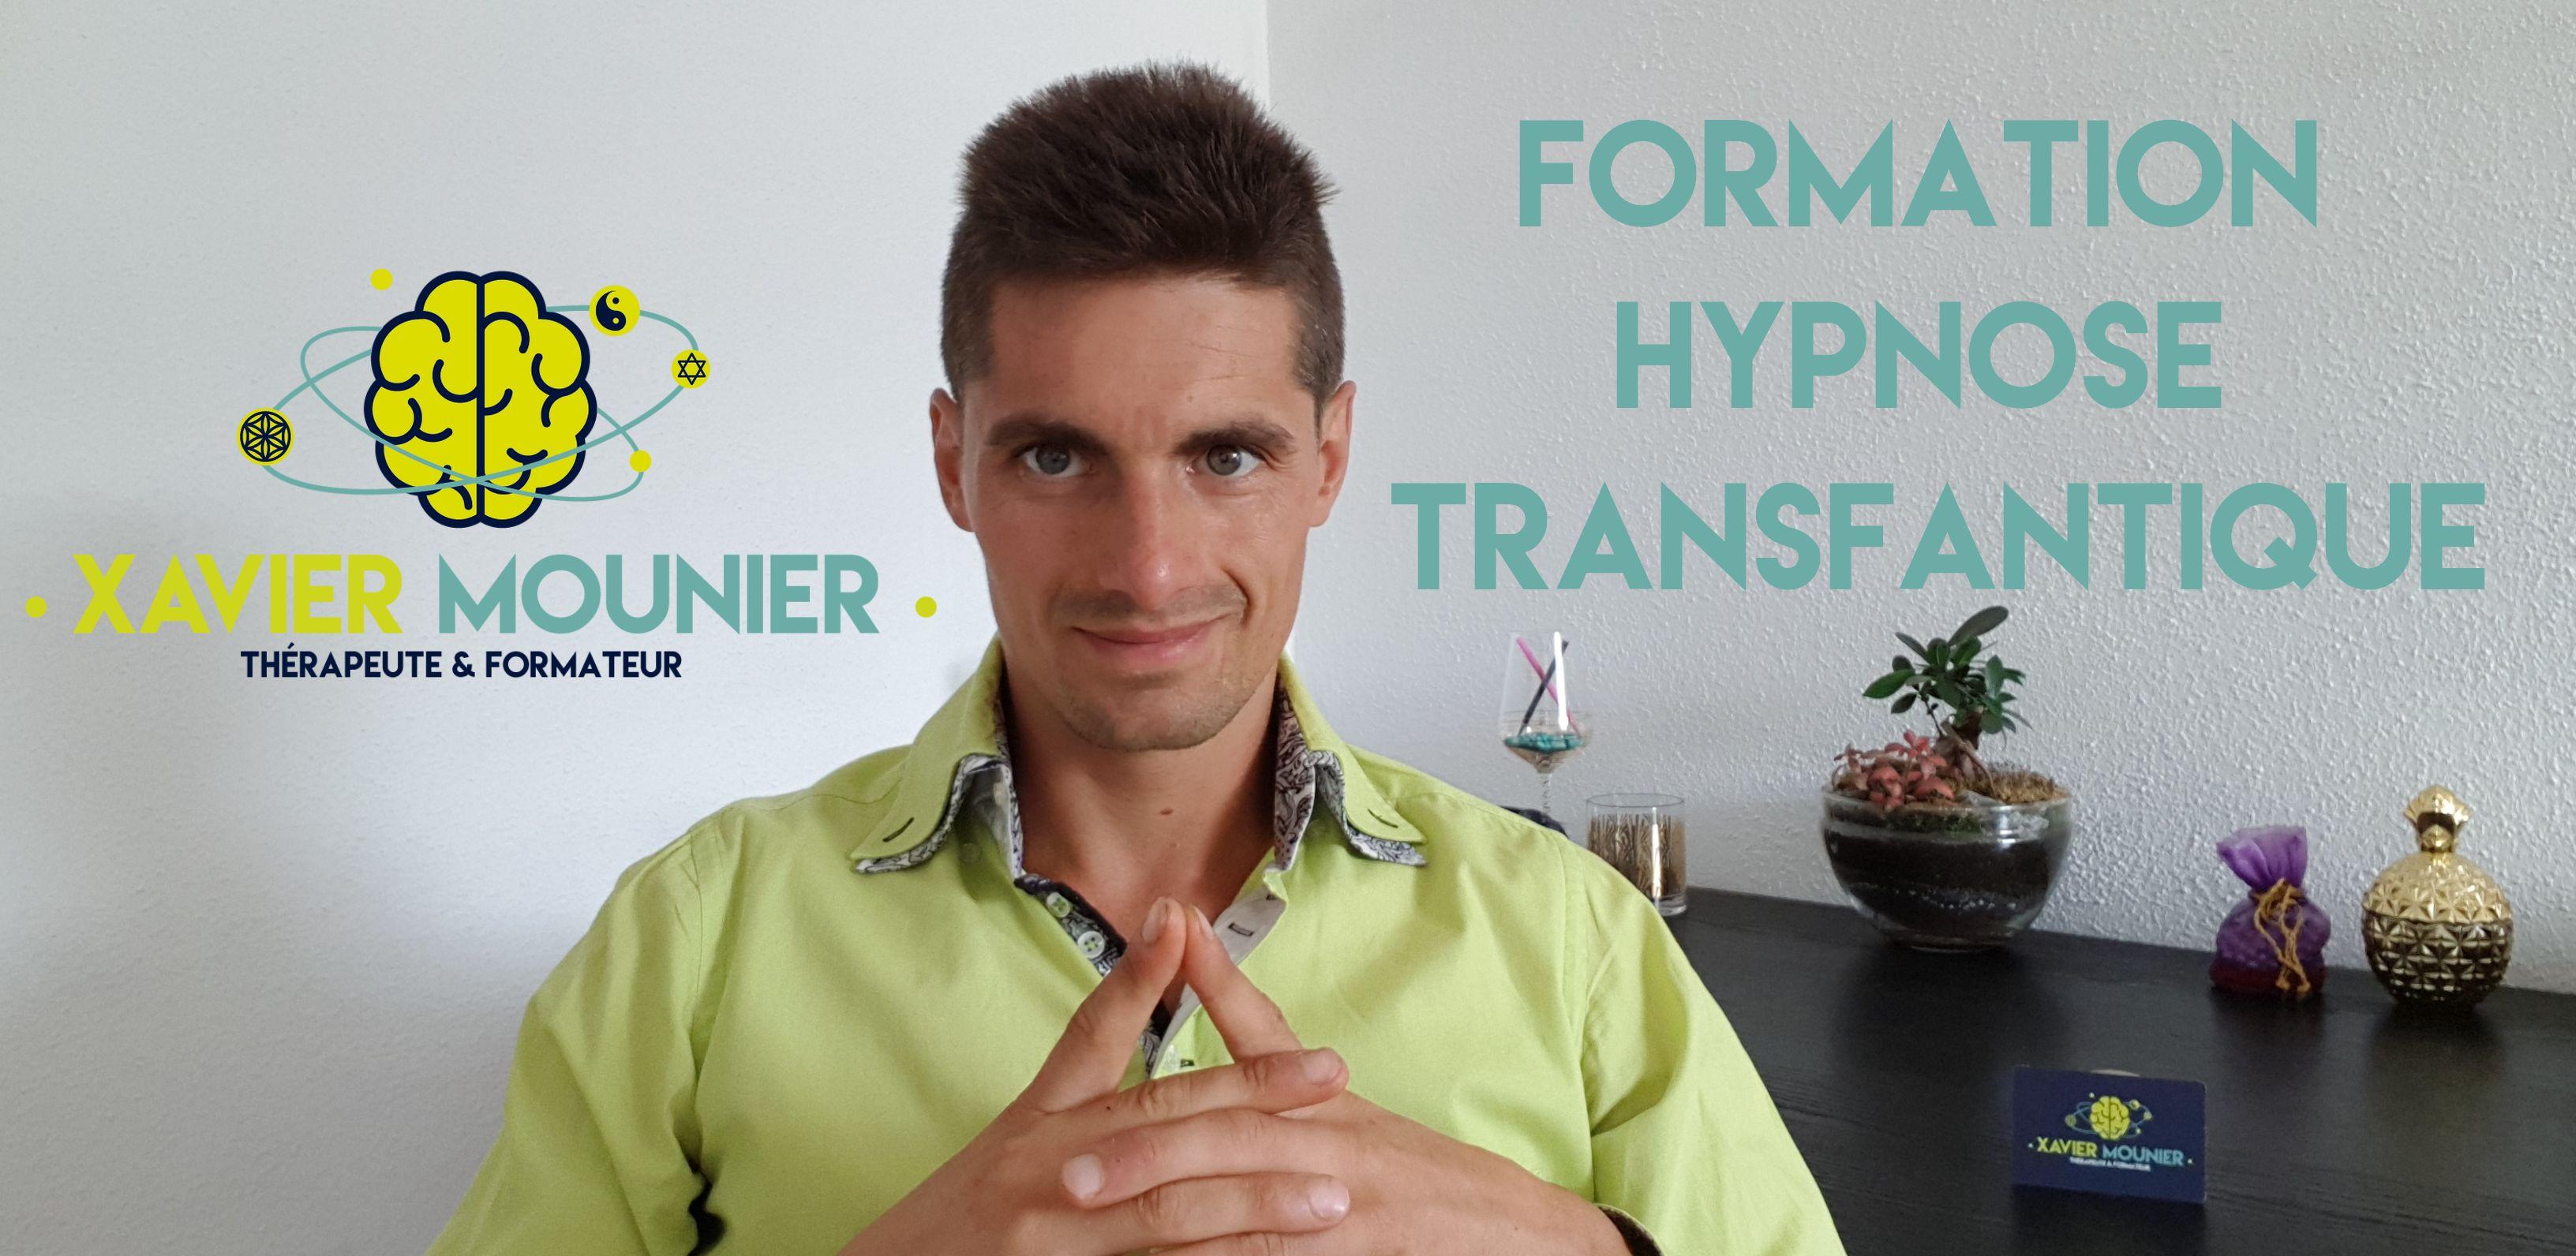 Formation hypnose transfantique